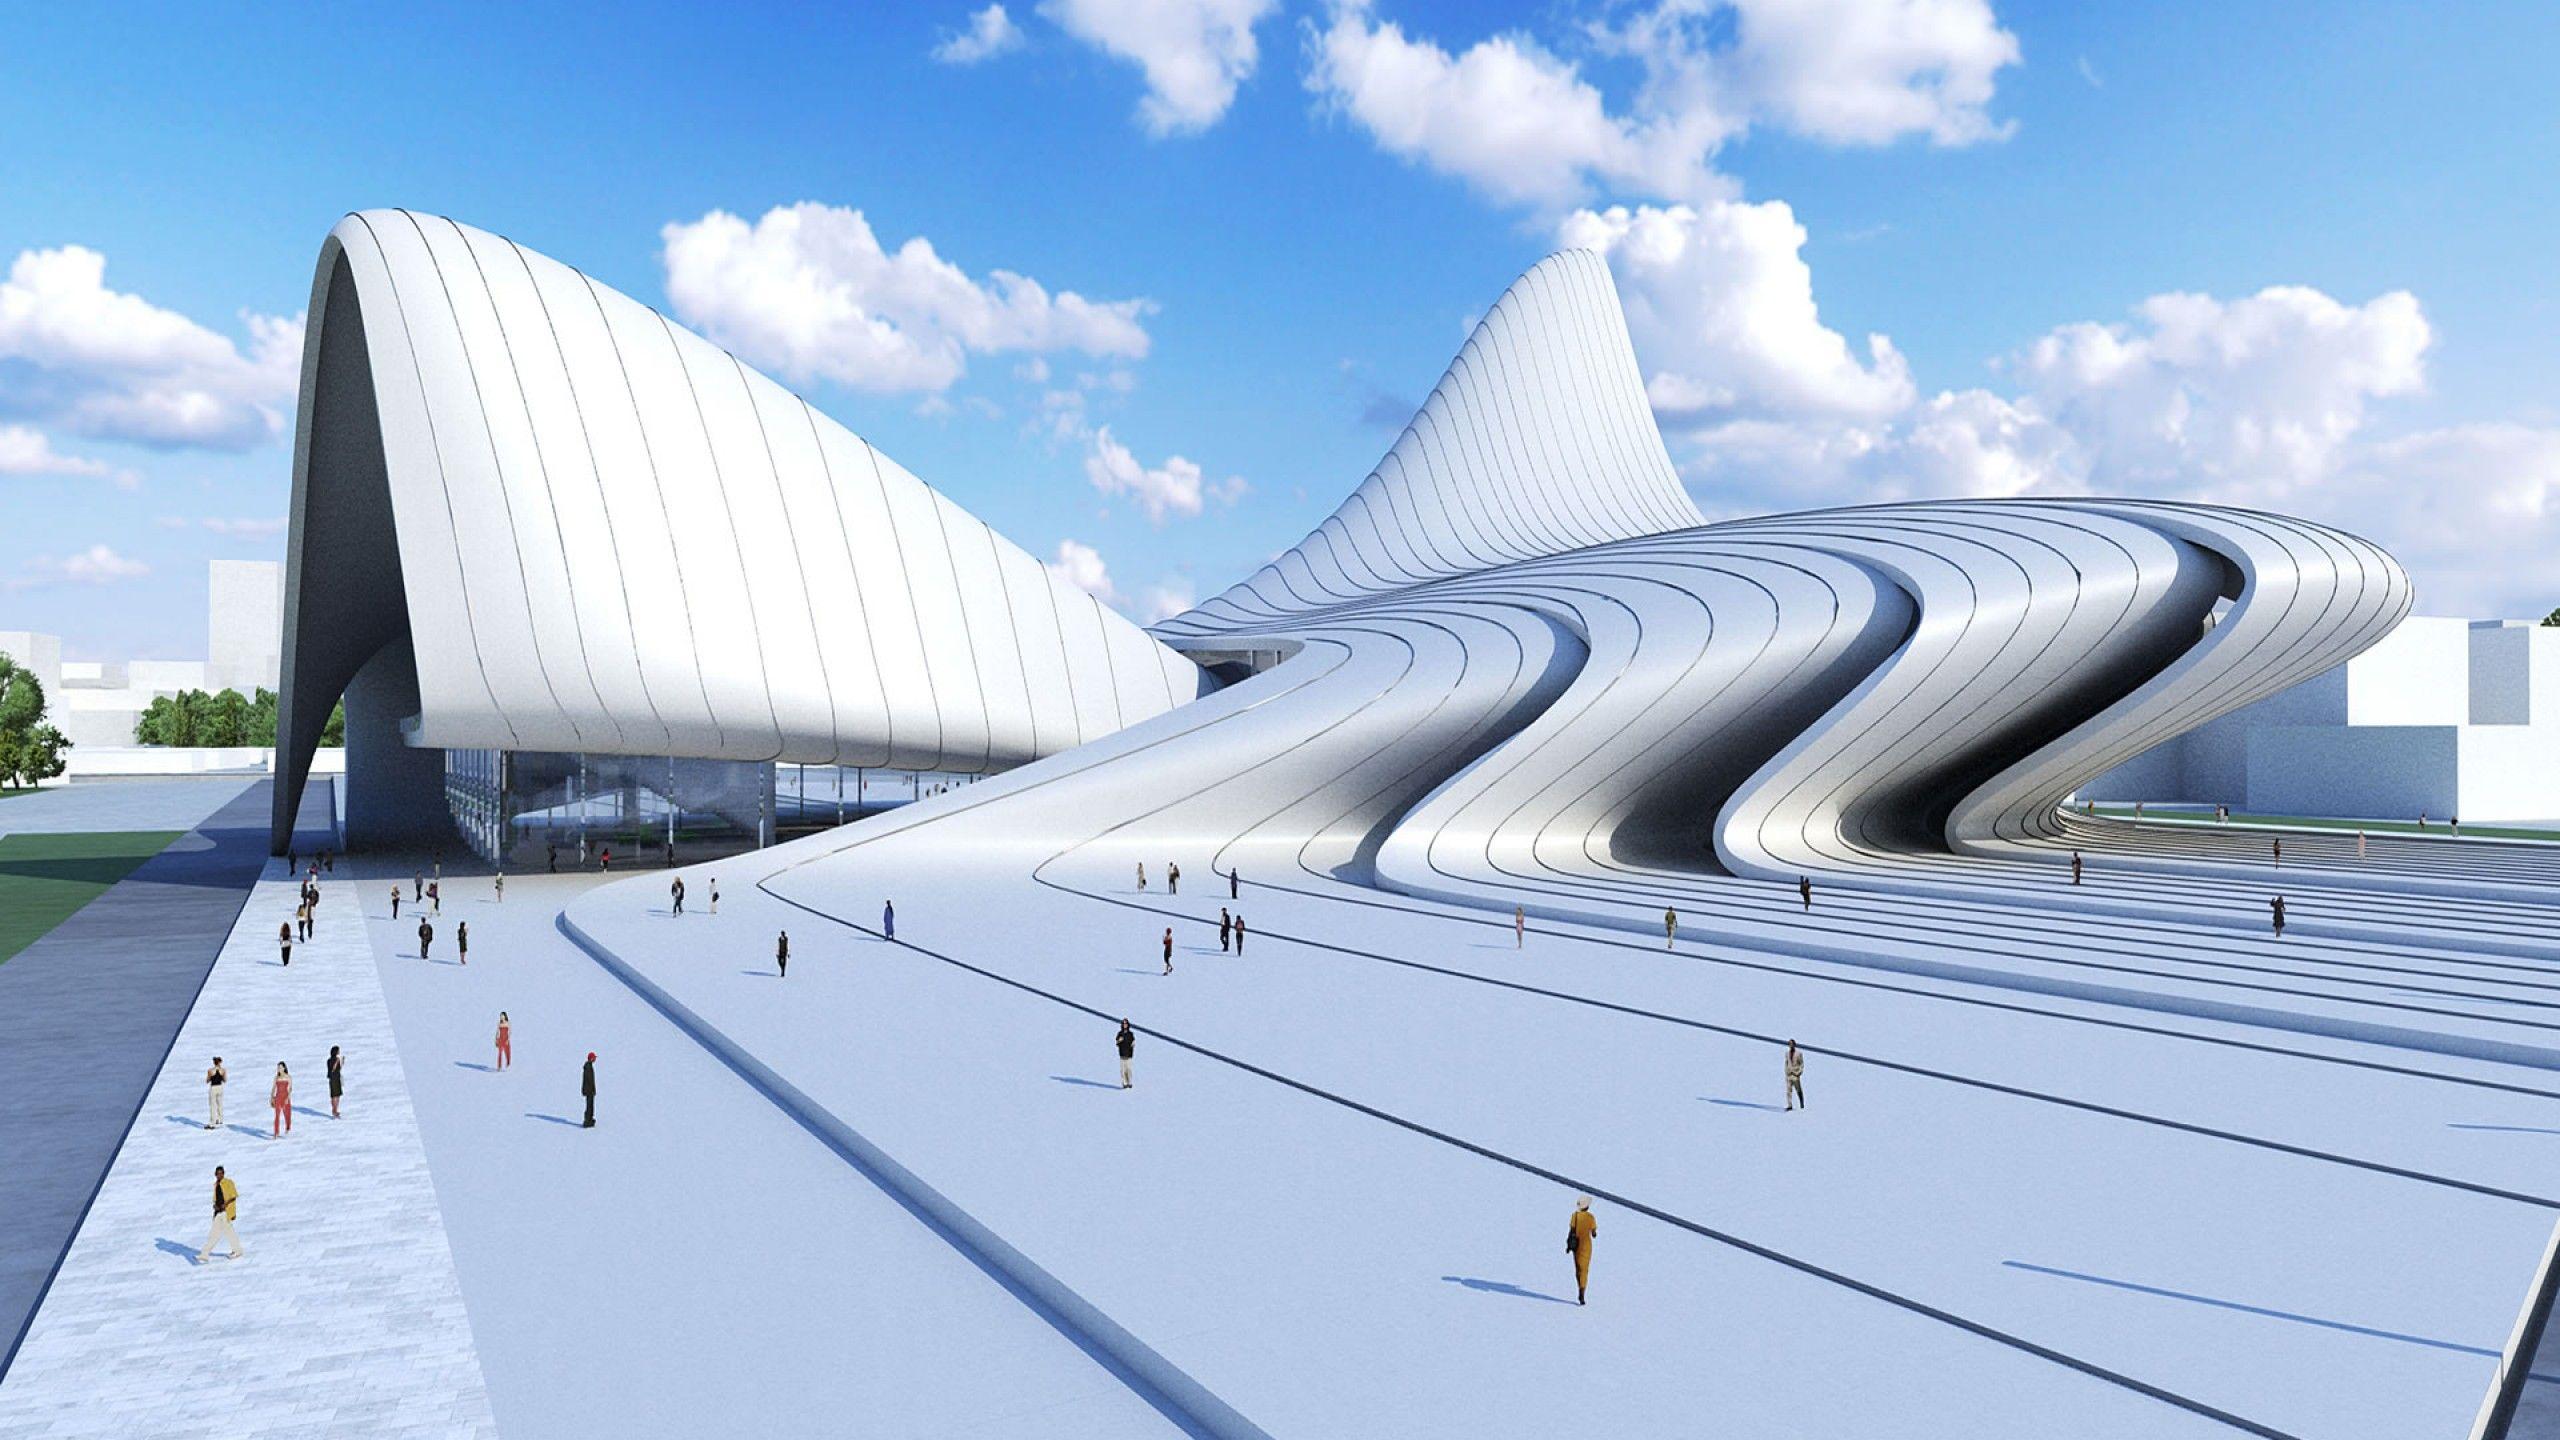 Fondos De Pantalla De Arquitectura De Zaha Hadid